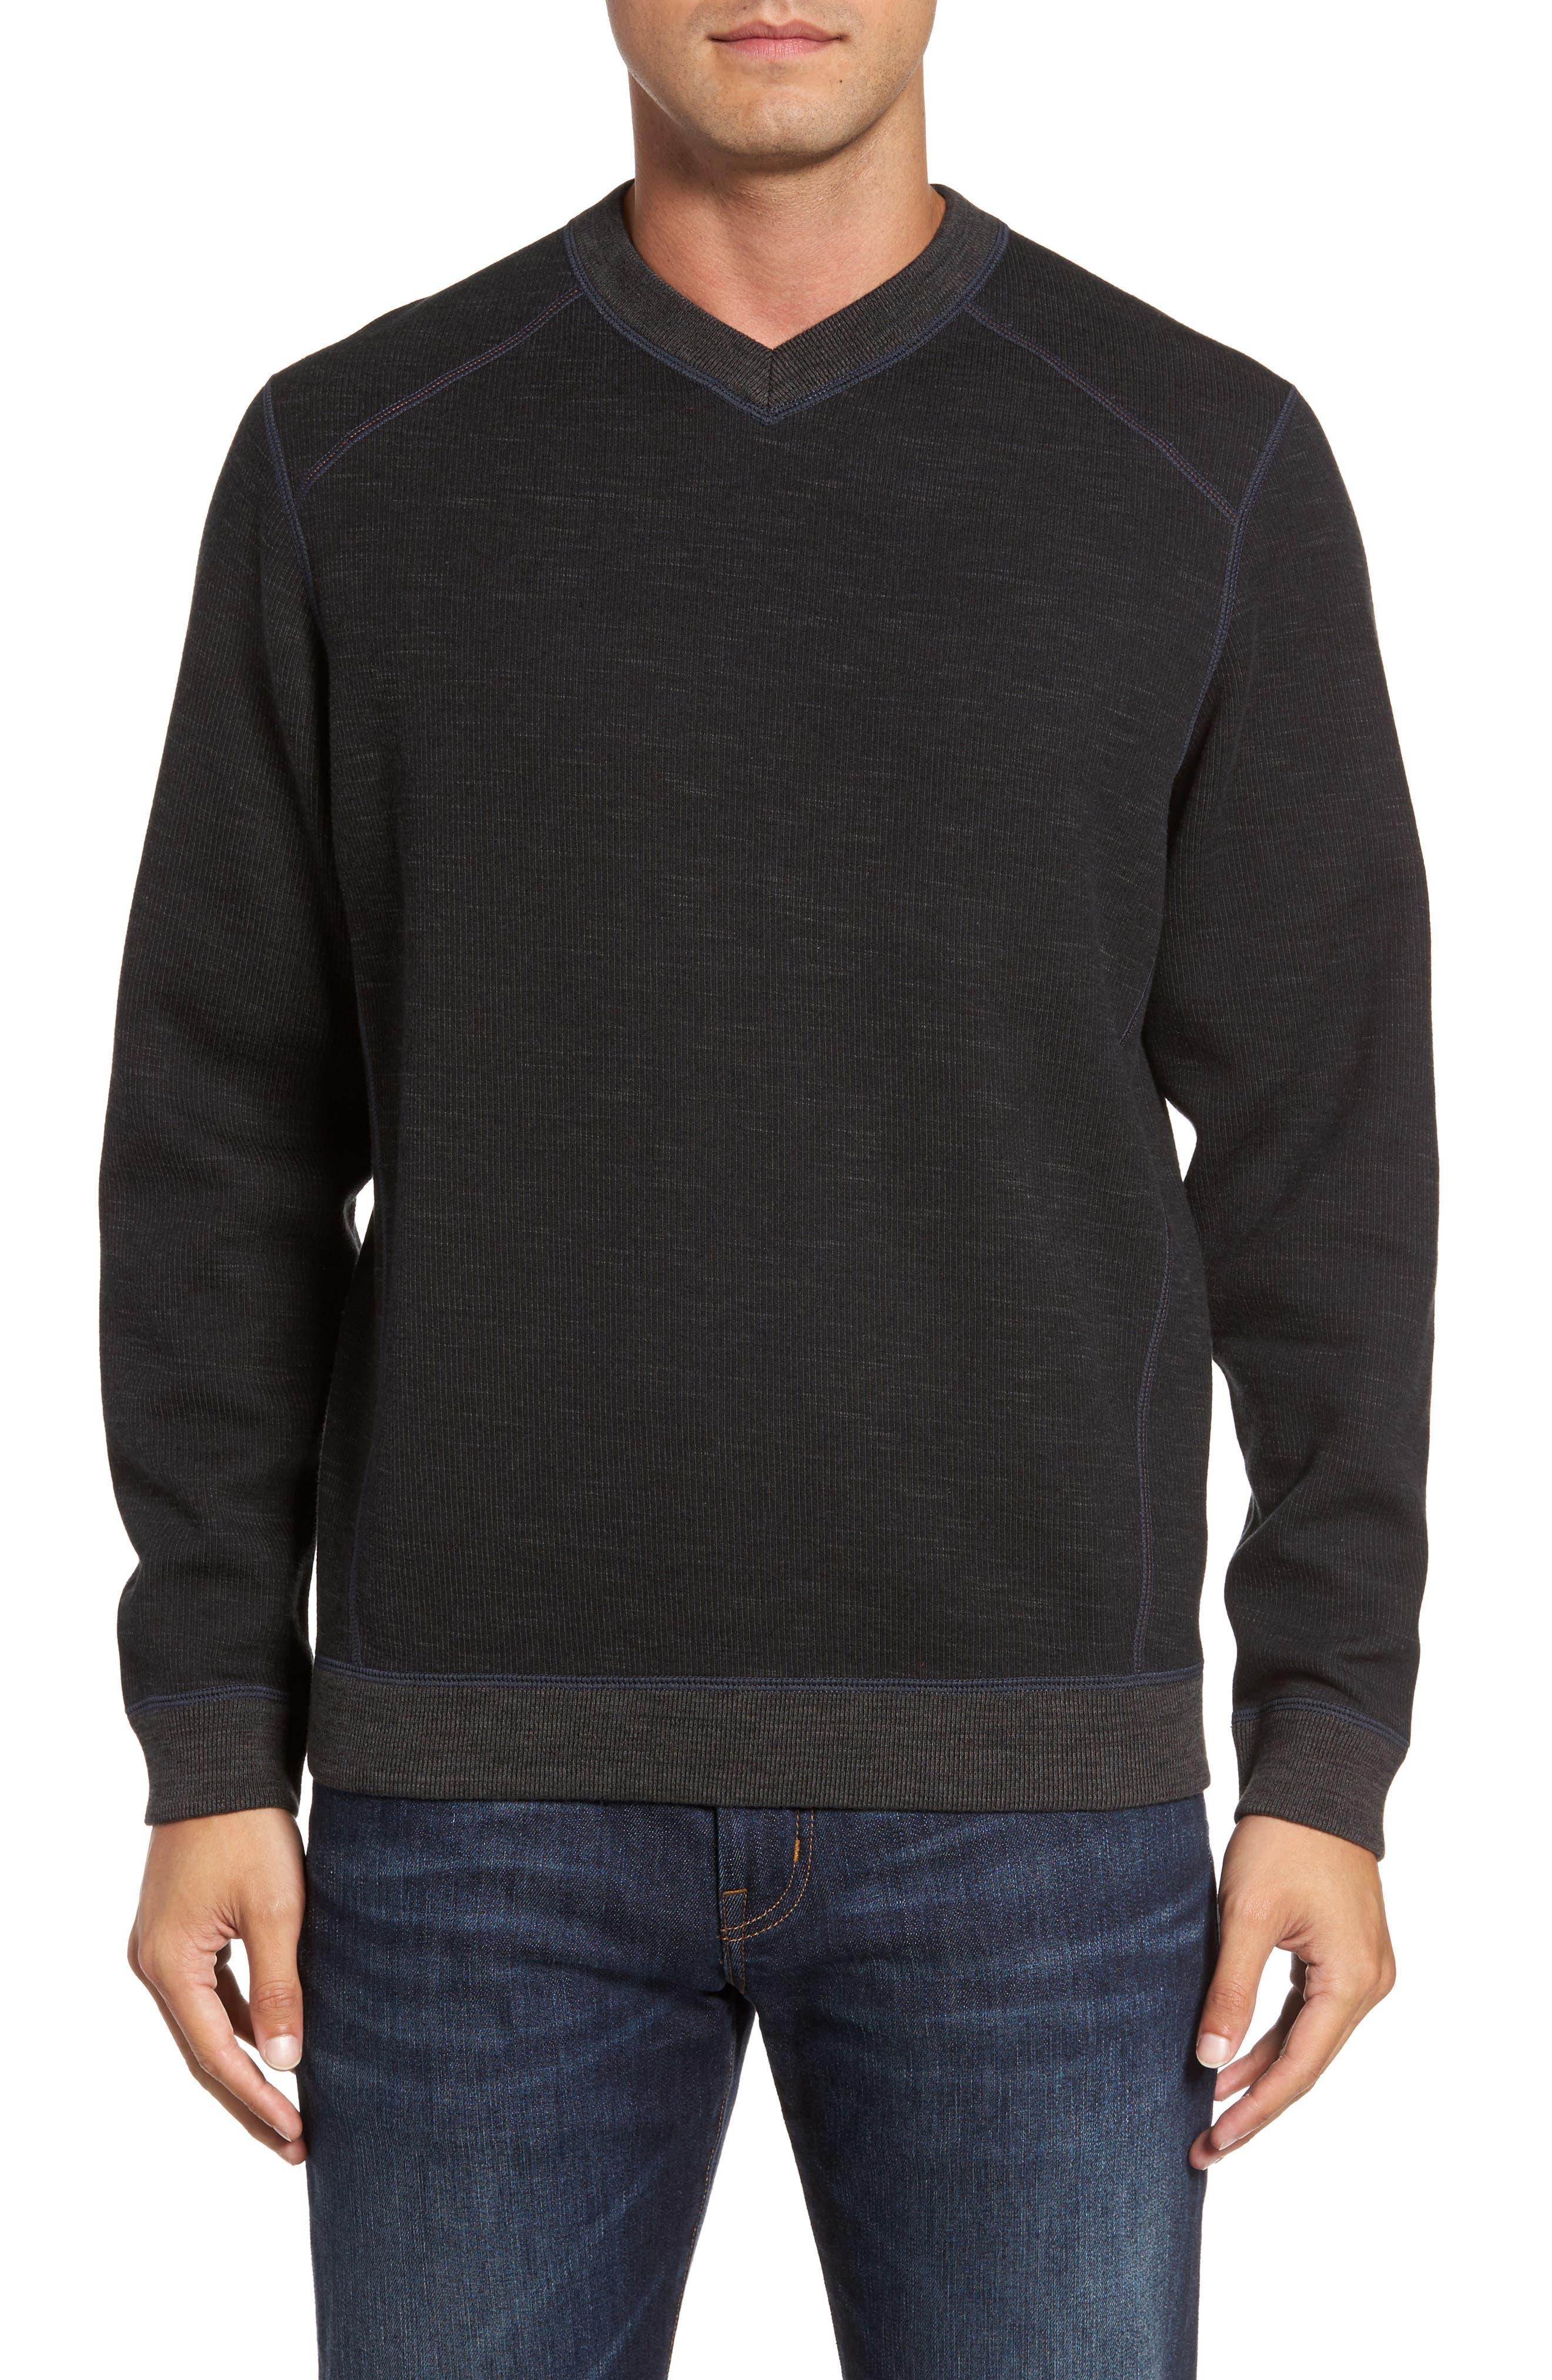 Flipside Pro Reversible Sweatshirt,                         Main,                         color, 001